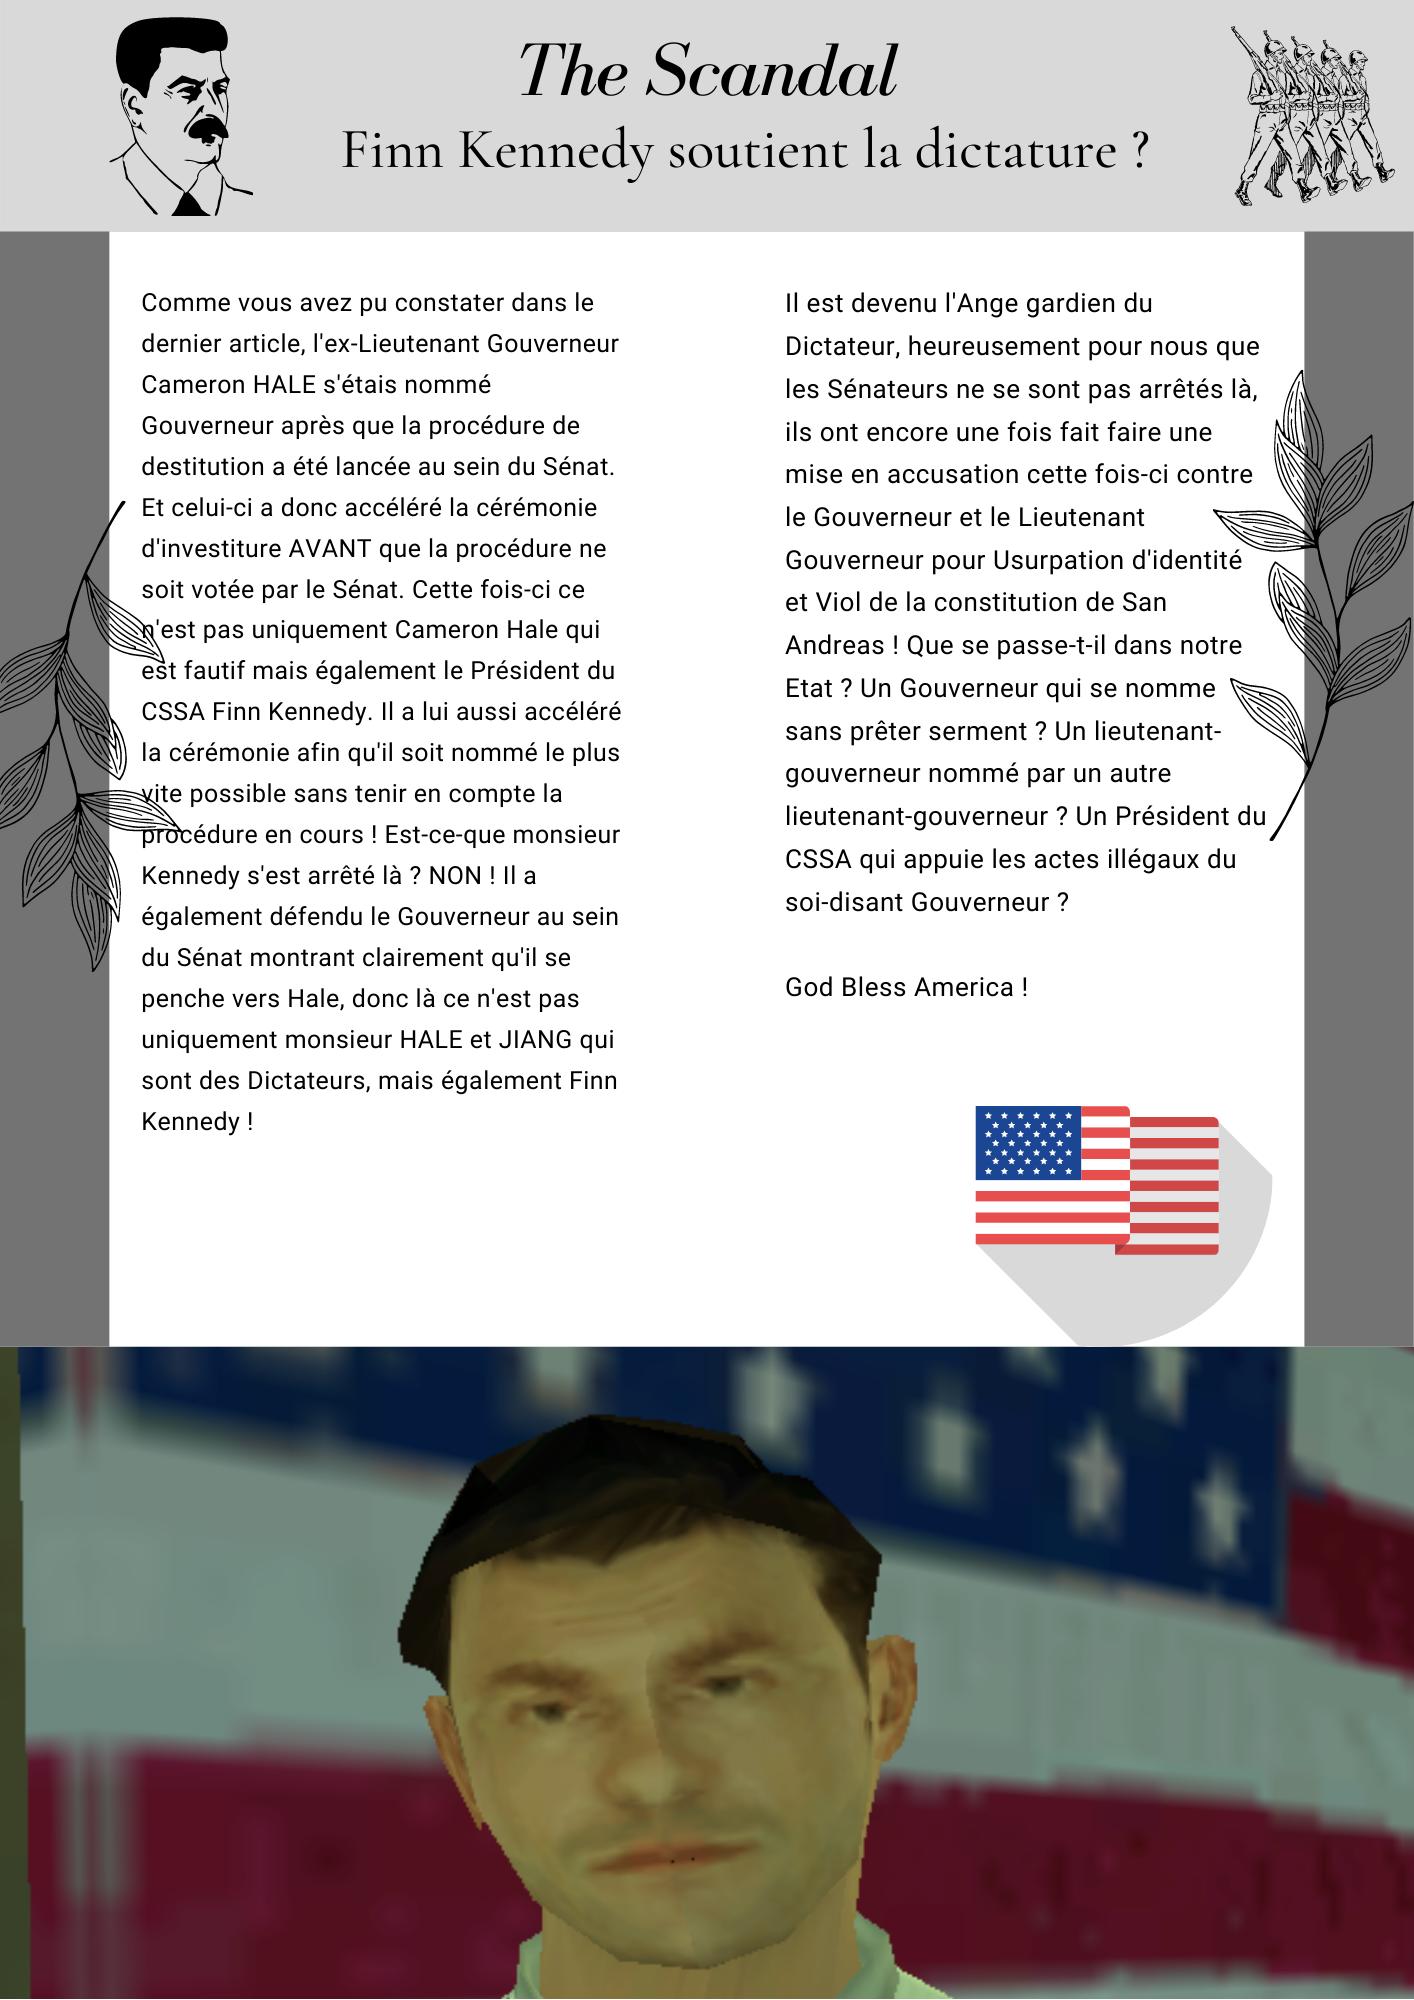 THE SCANDAL - Finn Kennedy soutient la dictature ? The_Scandal